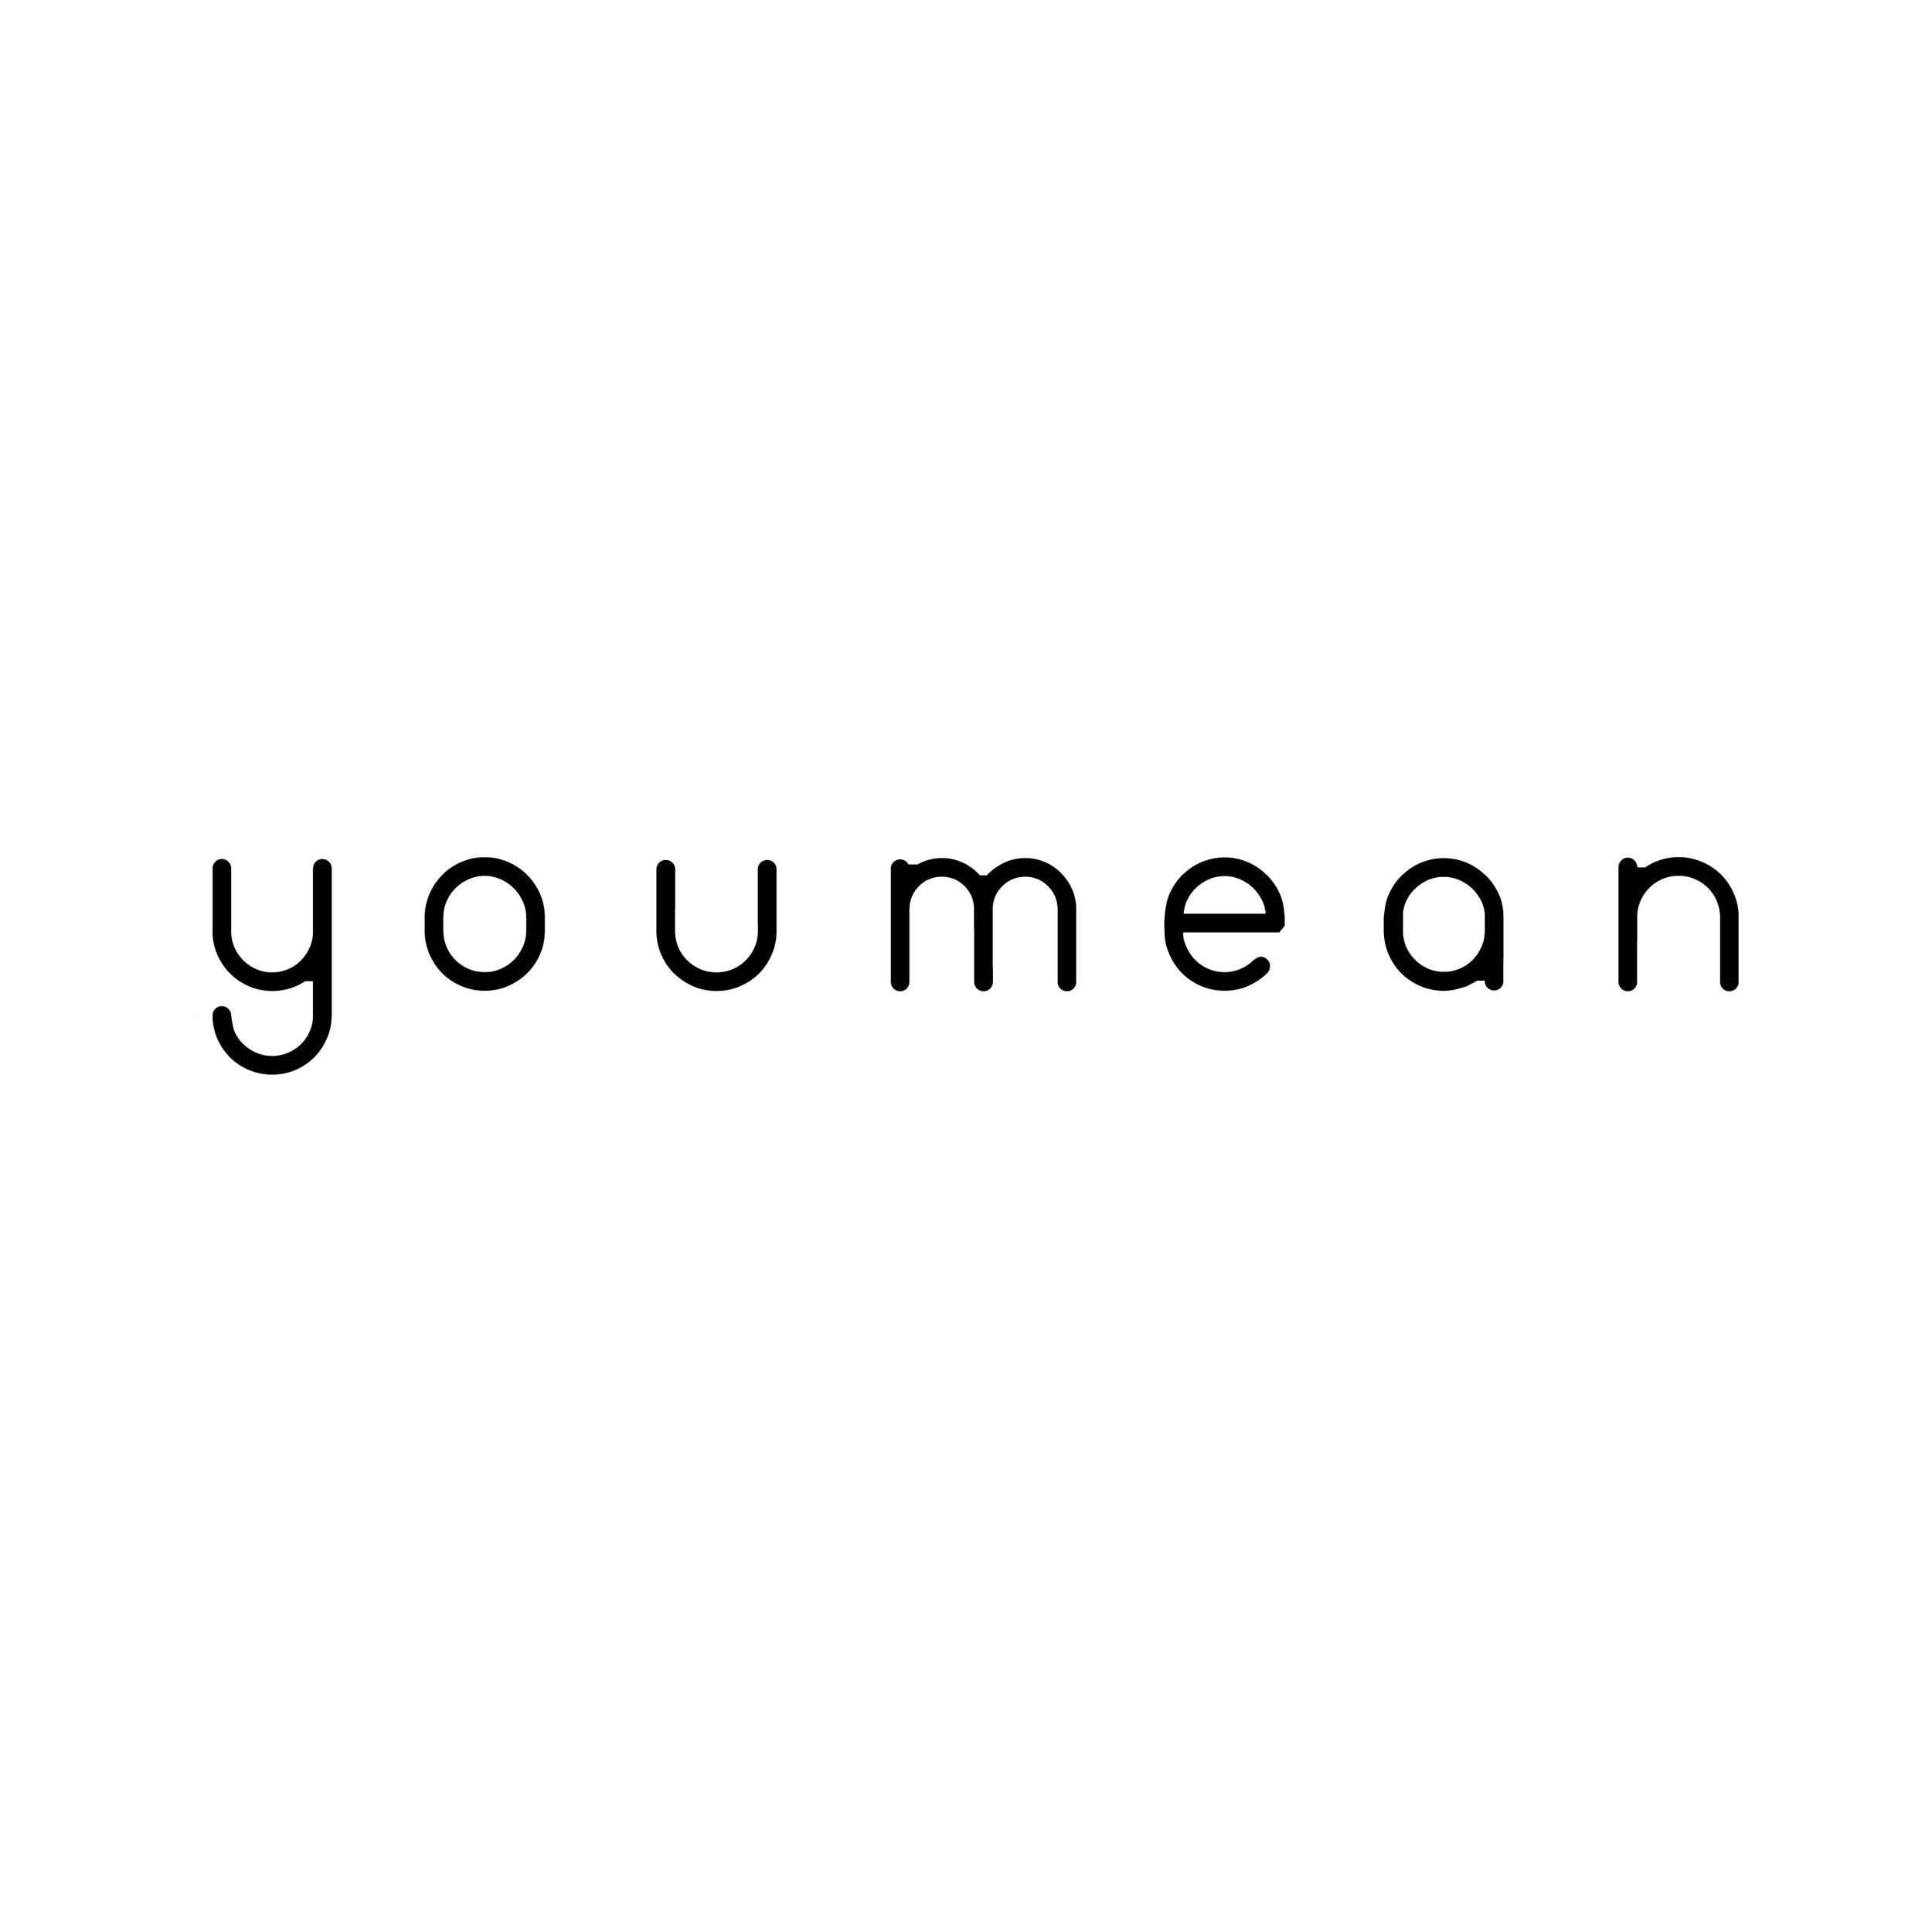 youmean_logo2 - 大島悠.jpg